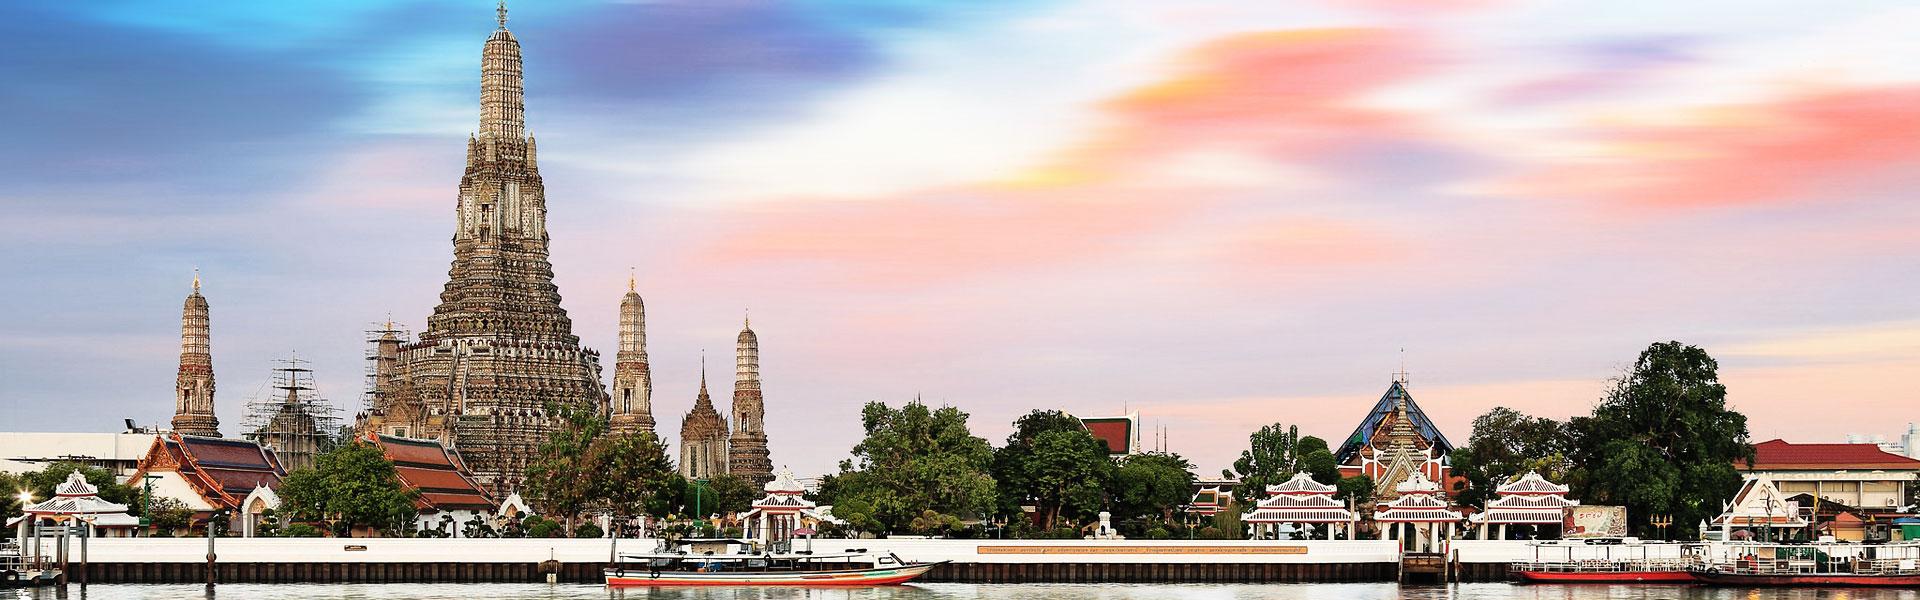 tailandia indochina